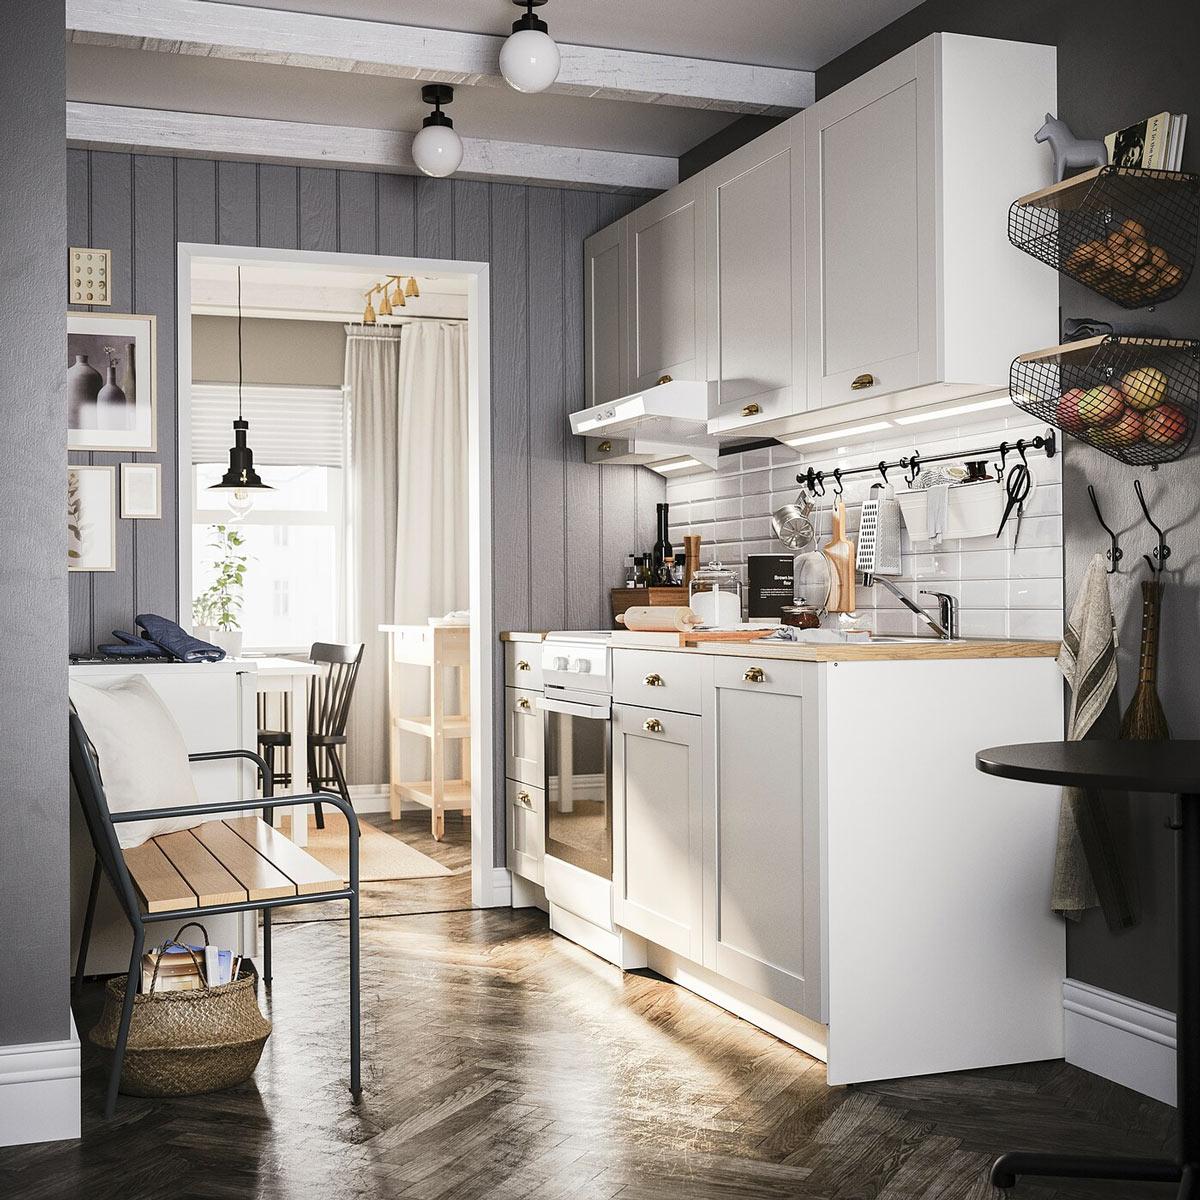 La cucina modulare KNOXHULT IKEA